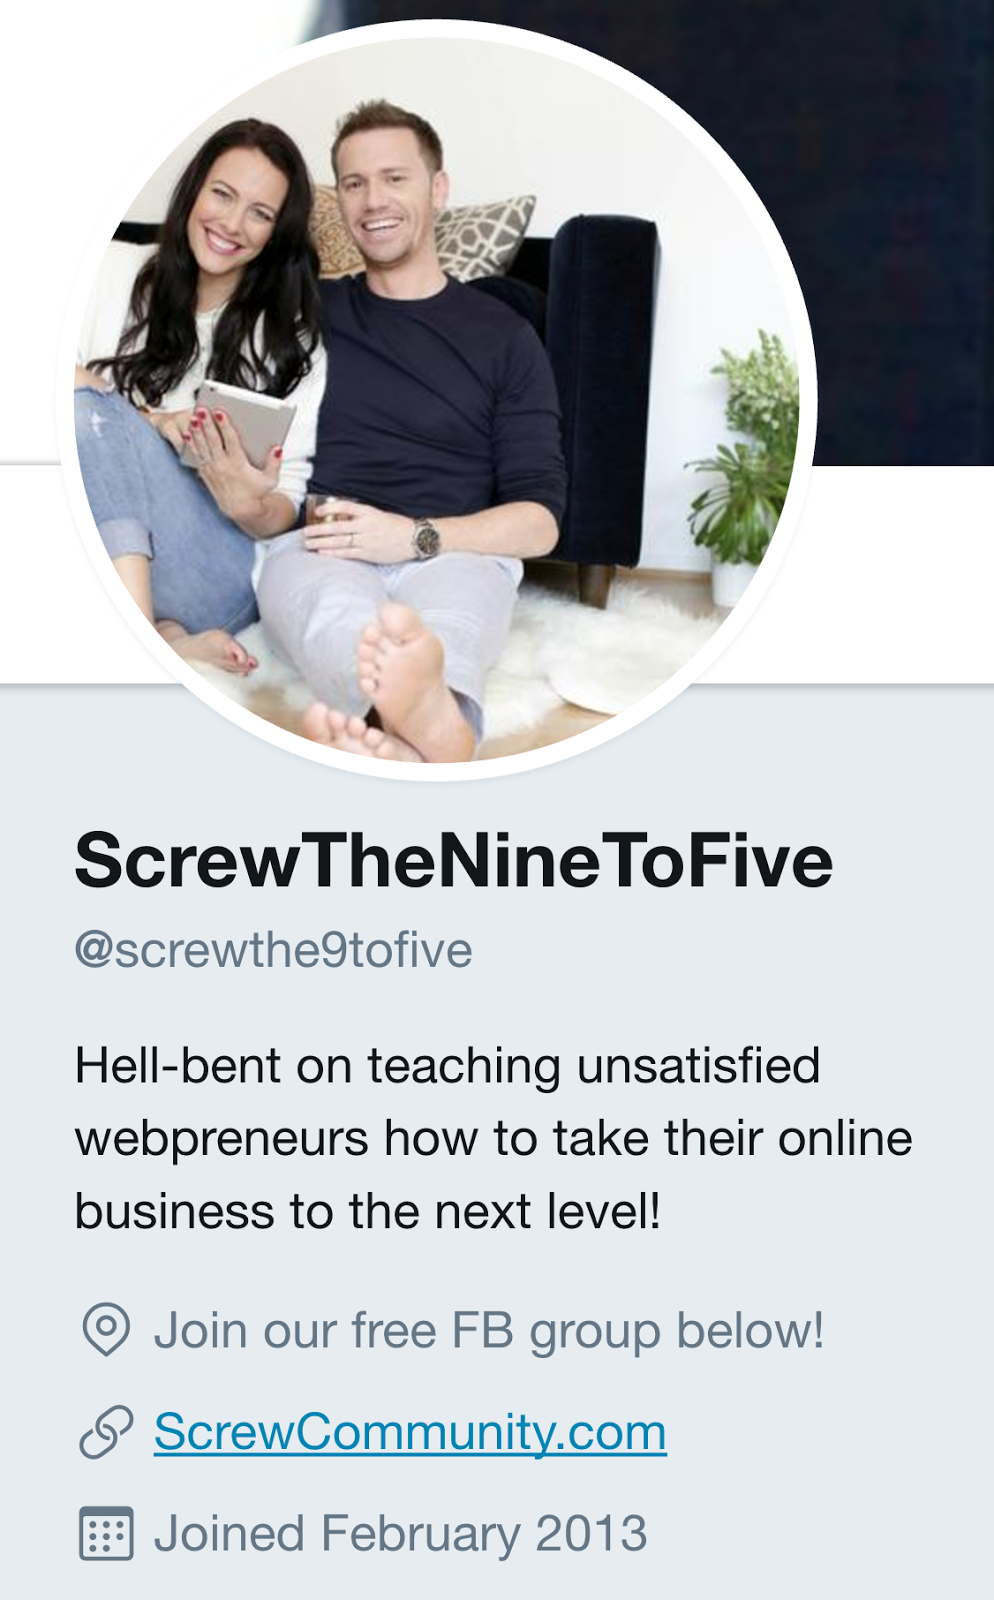 screwtheninetofive twitter optin.png